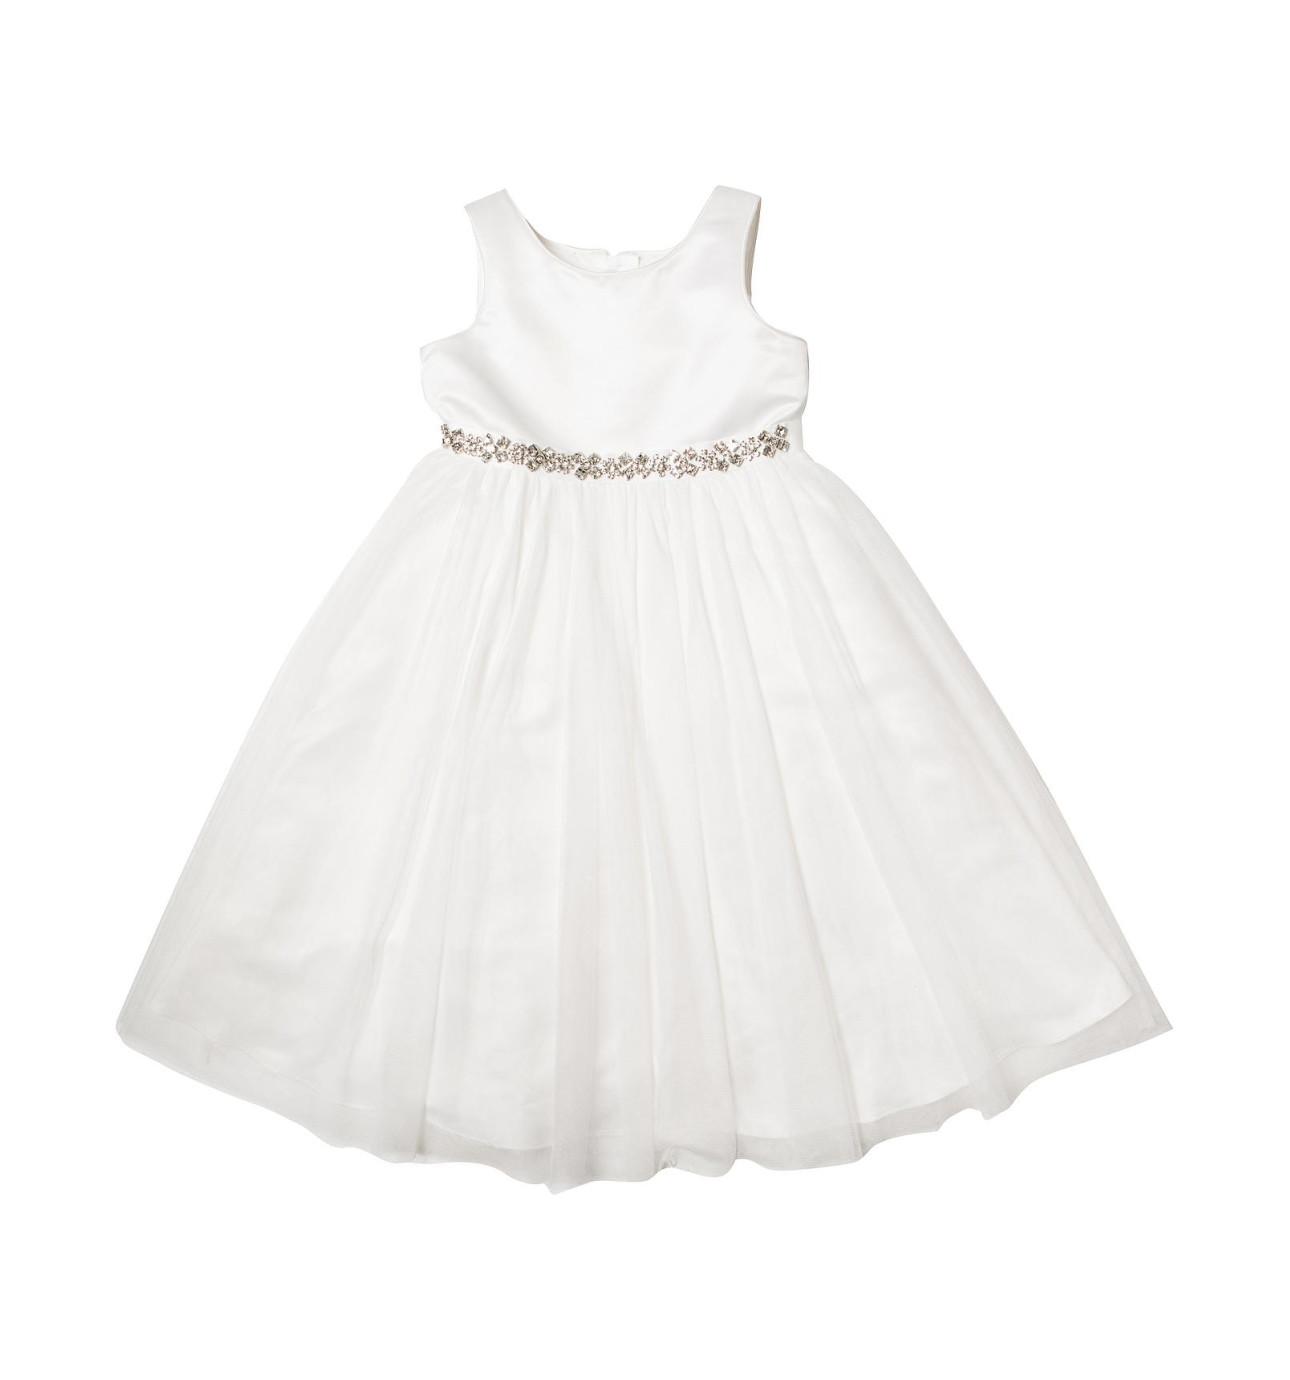 White dress david jones - Diamante Trimmed Dress